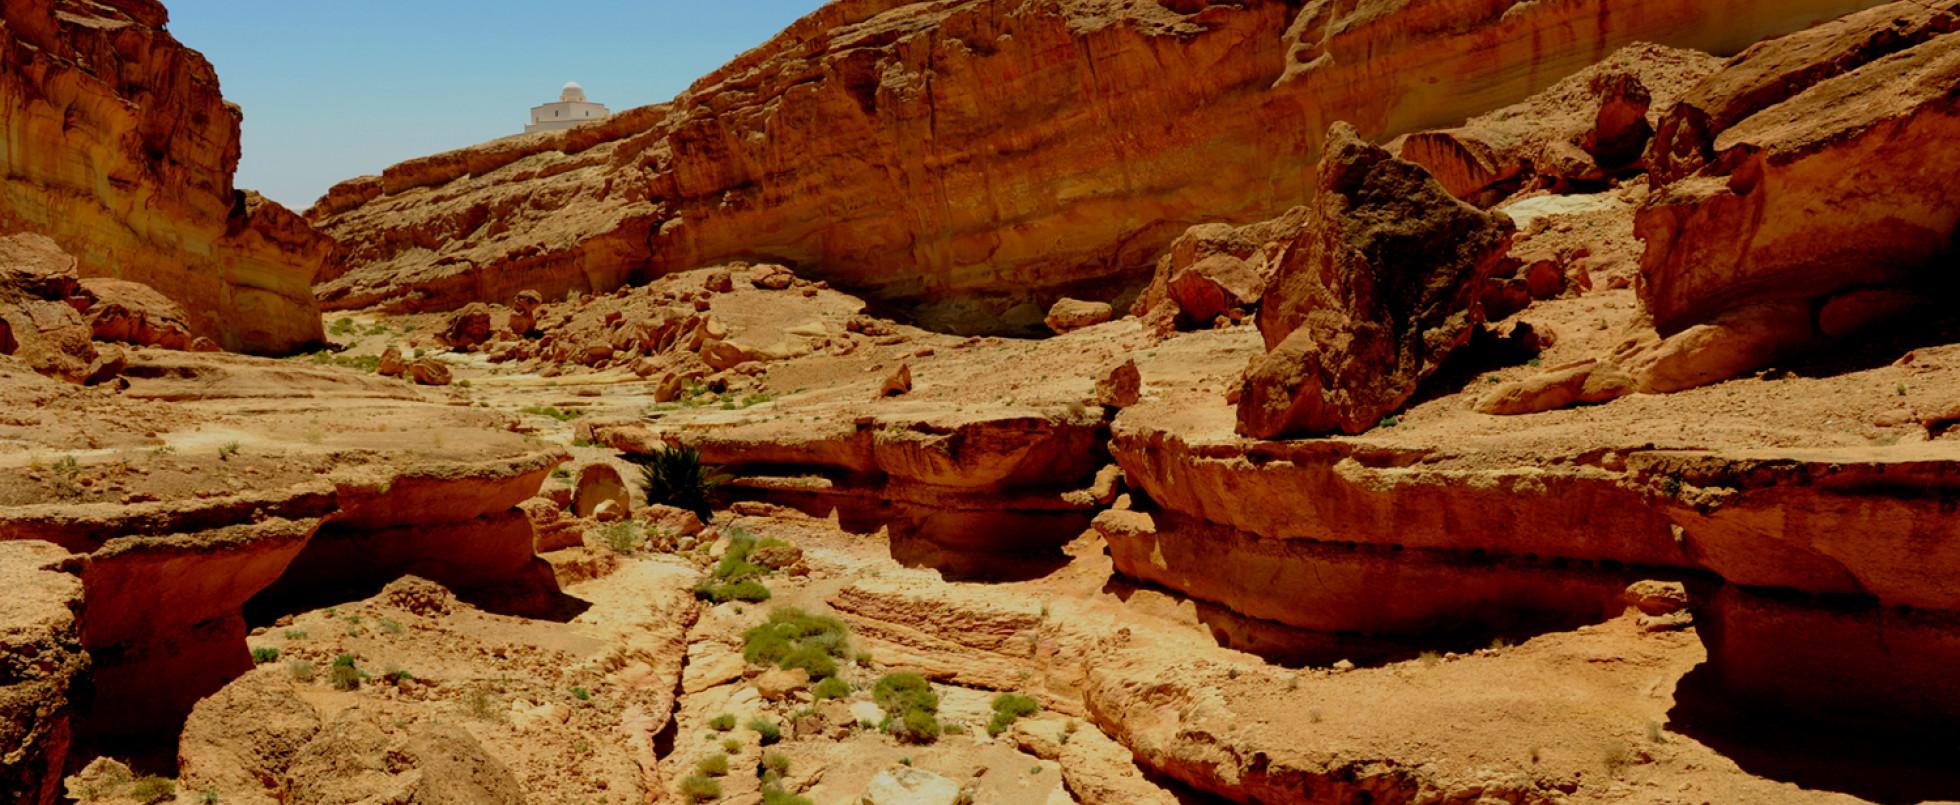 Jebel Krefane: Star Wars Canyon